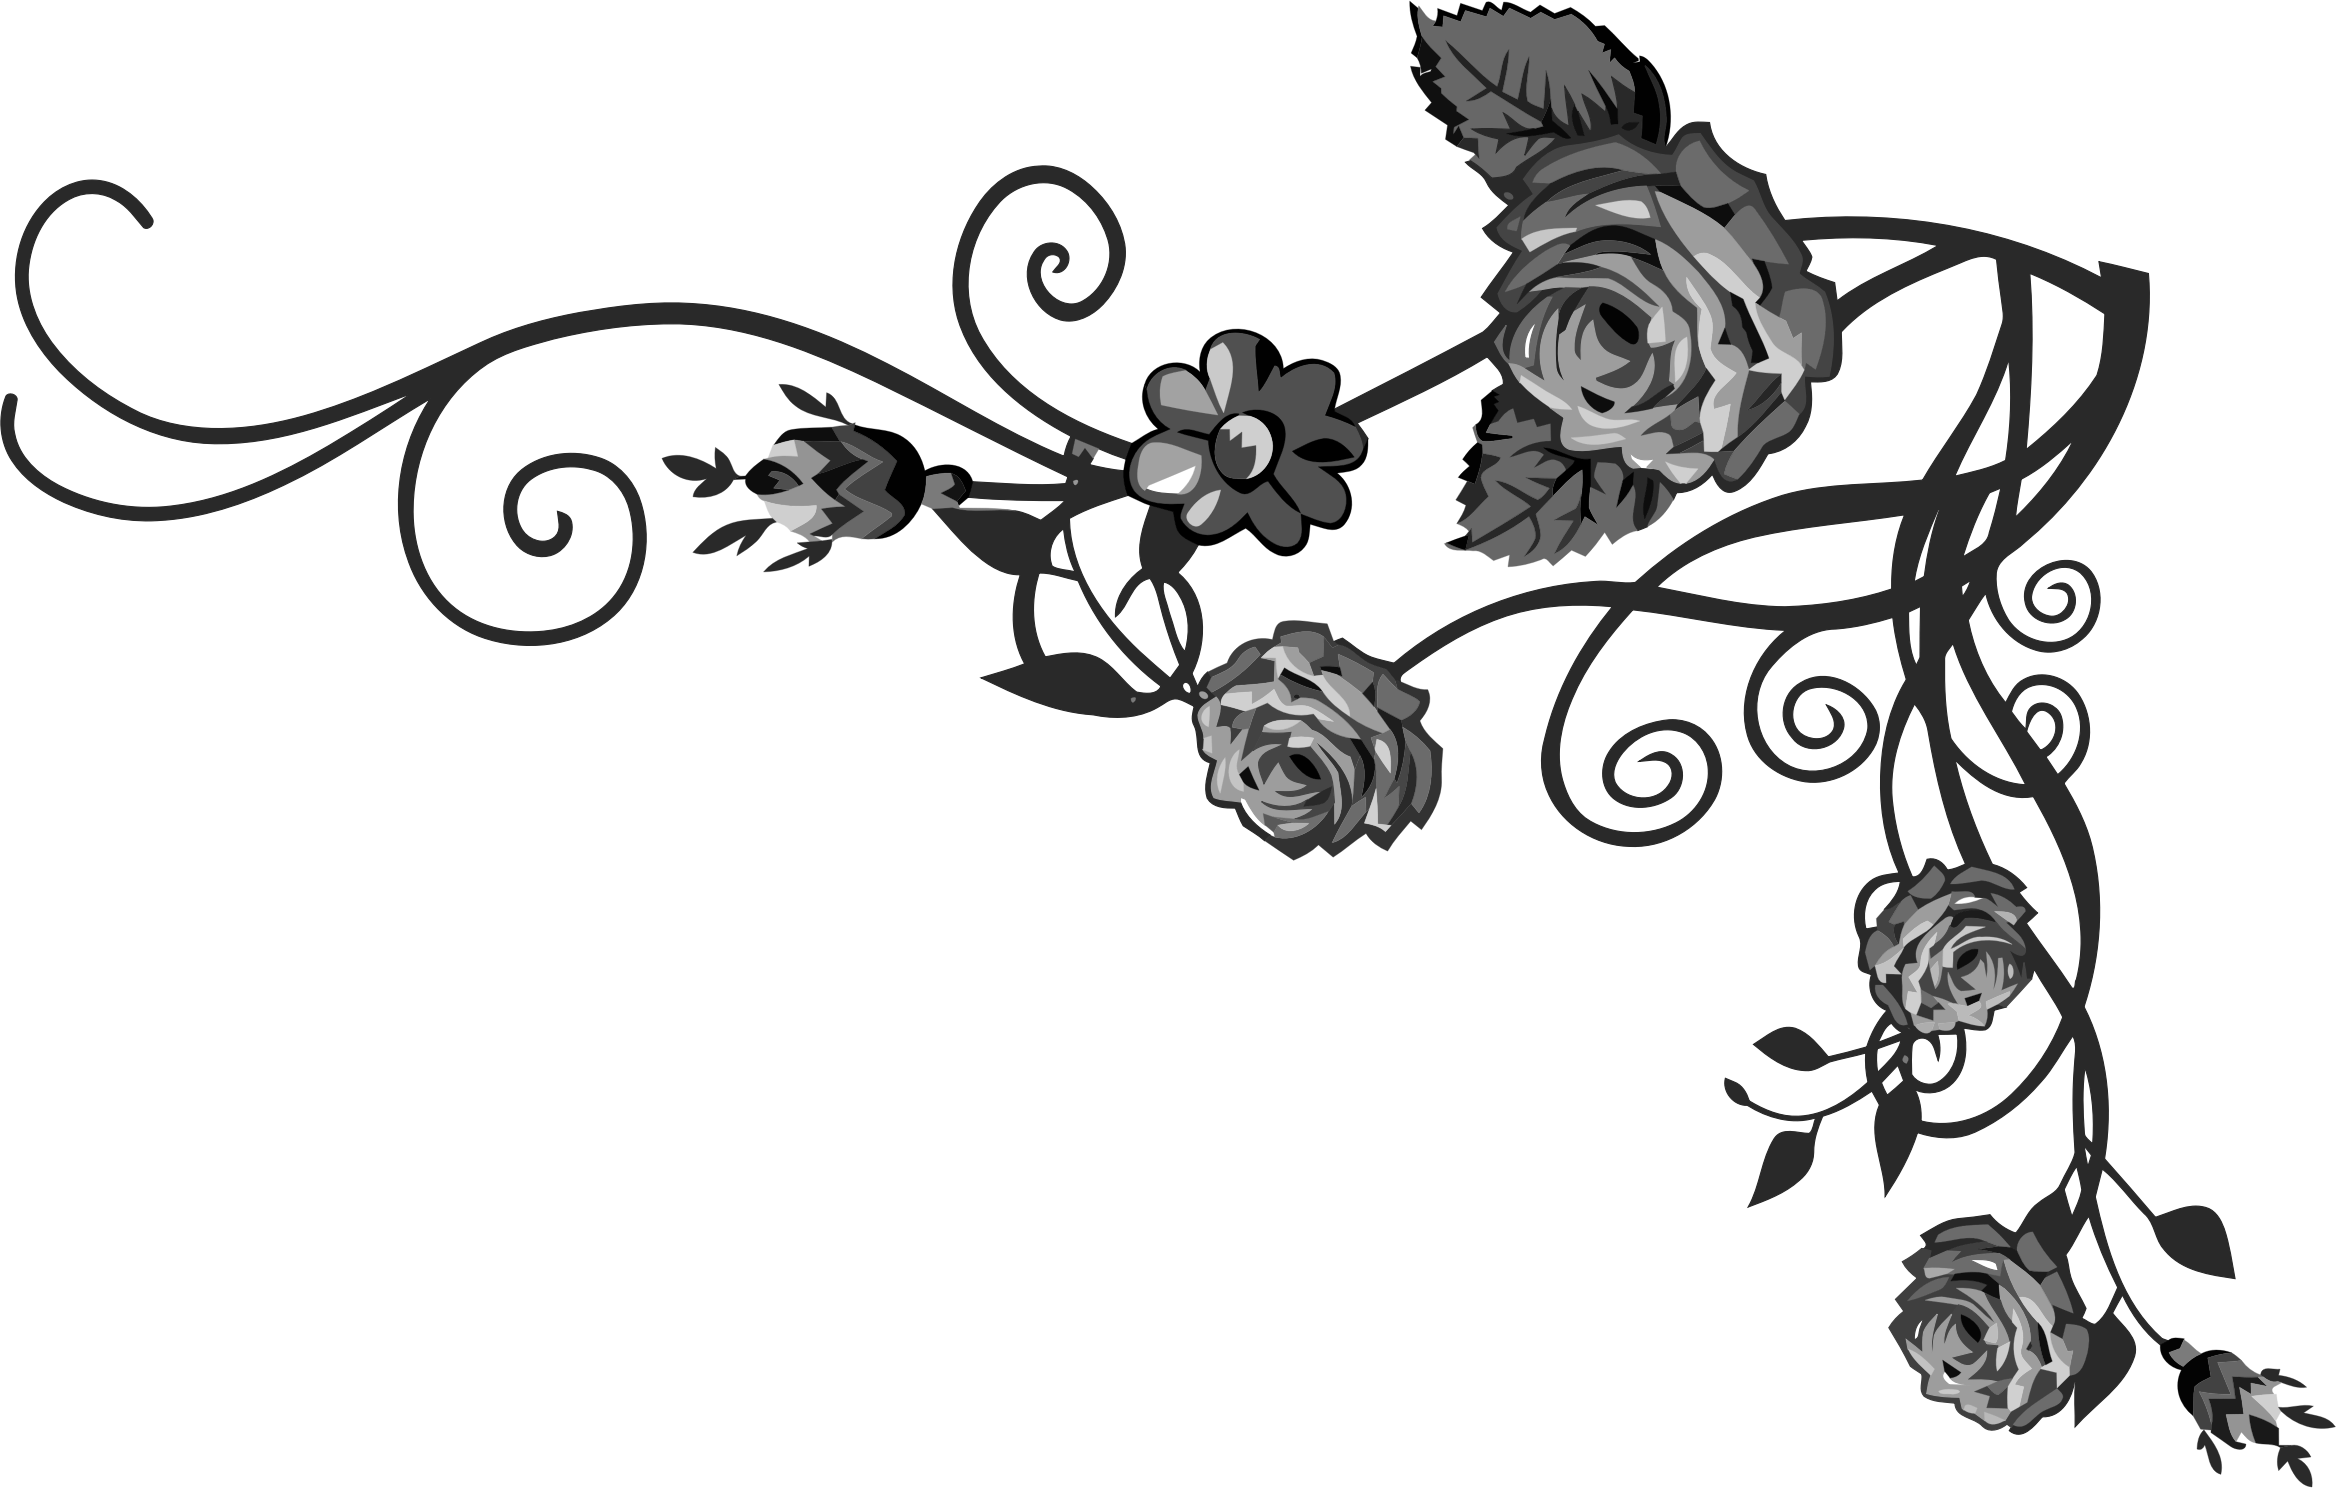 Flourishes clipart vine, Flourishes vine Transparent FREE ... - Black Rose Graphic